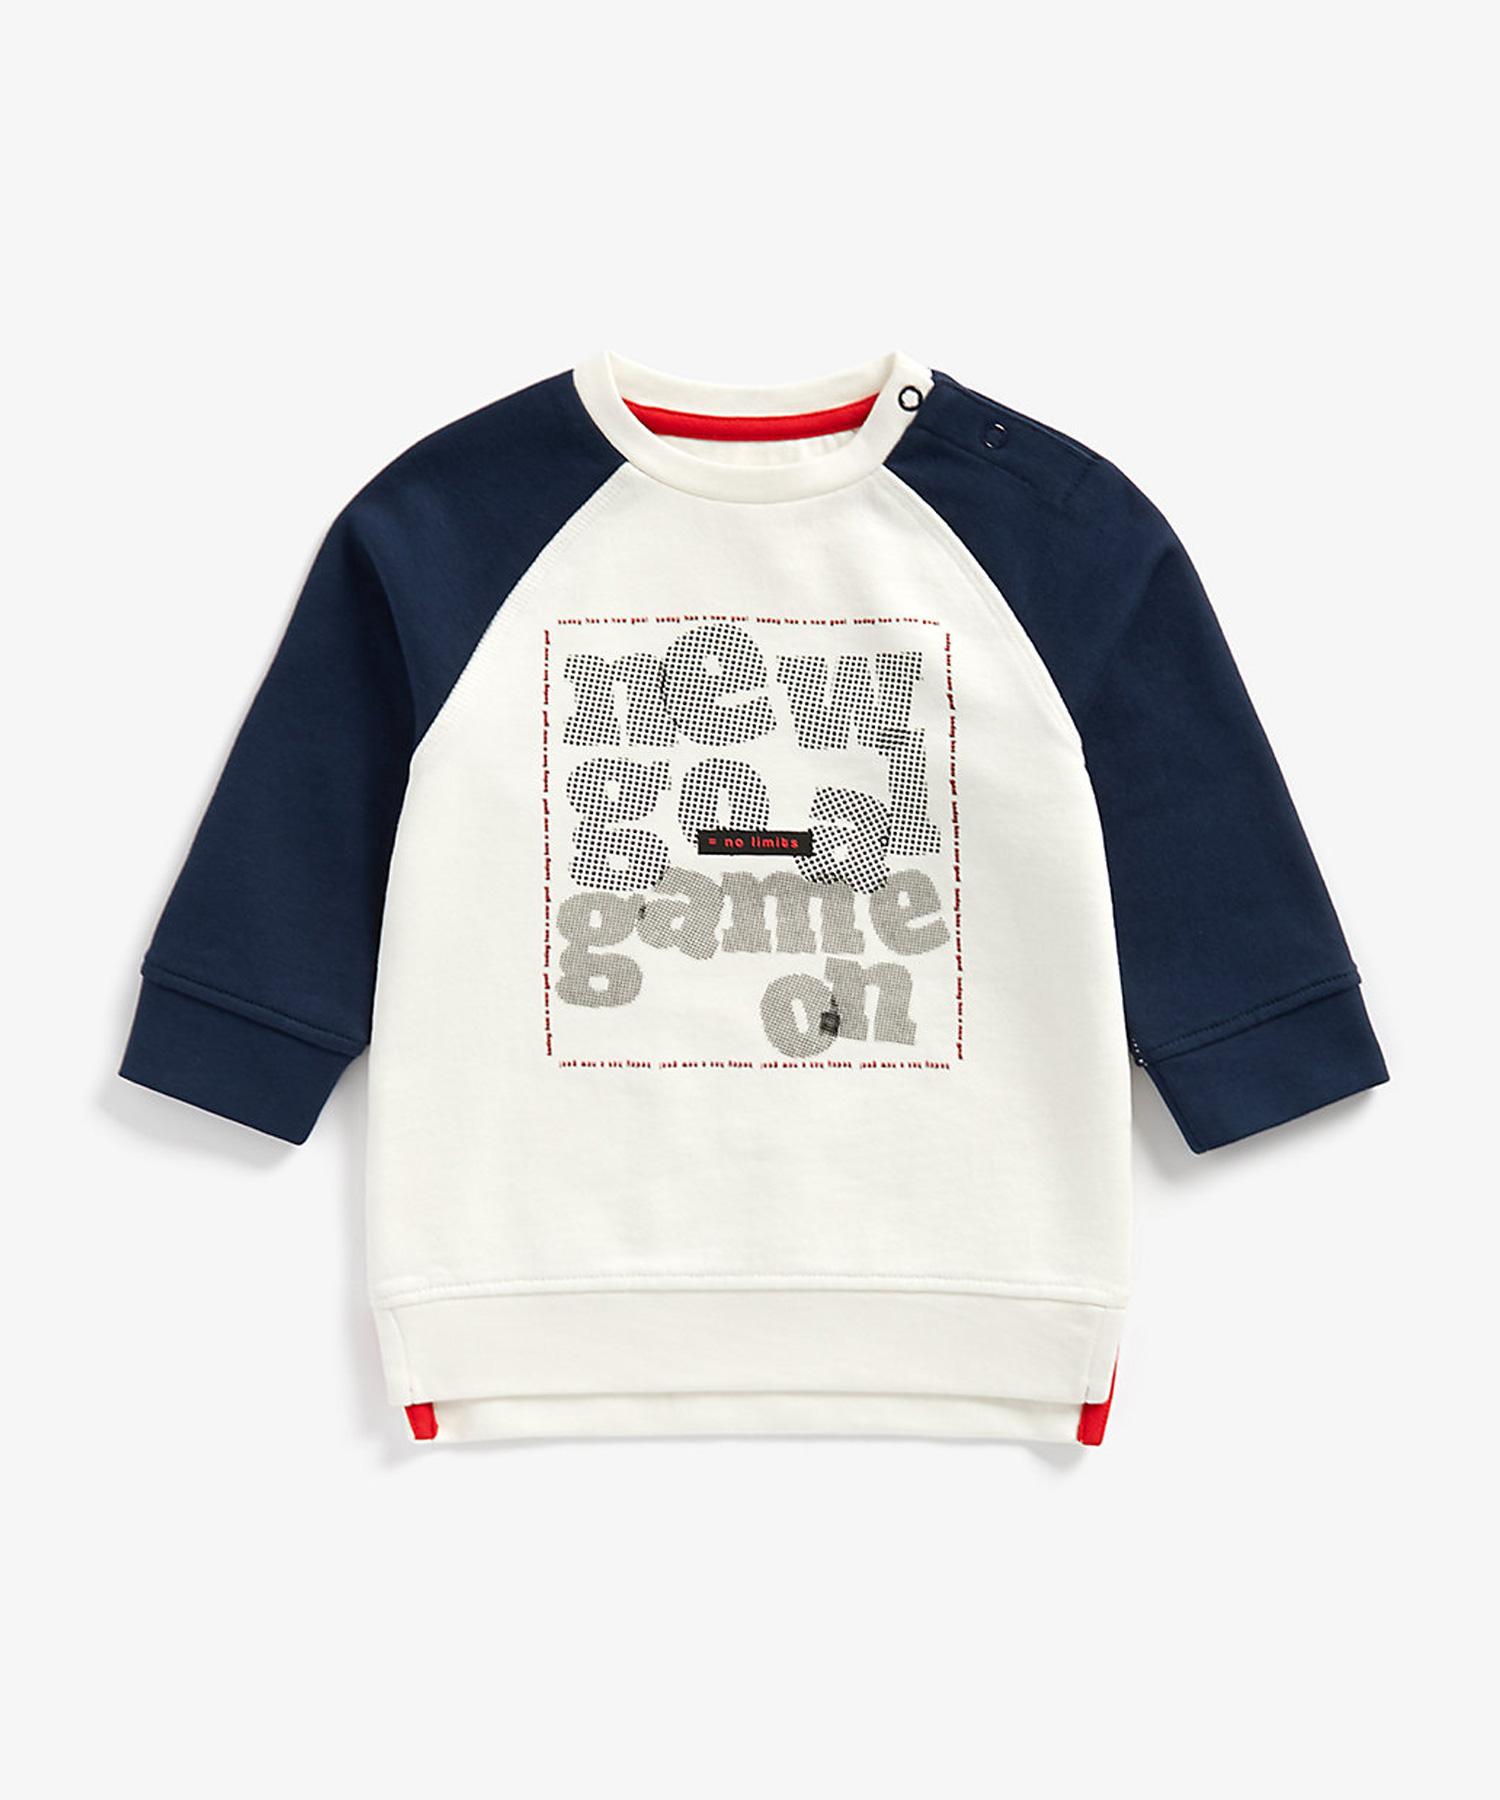 Mothercare | Boys Full Sleeves Sweatshirt Slogan Print - White